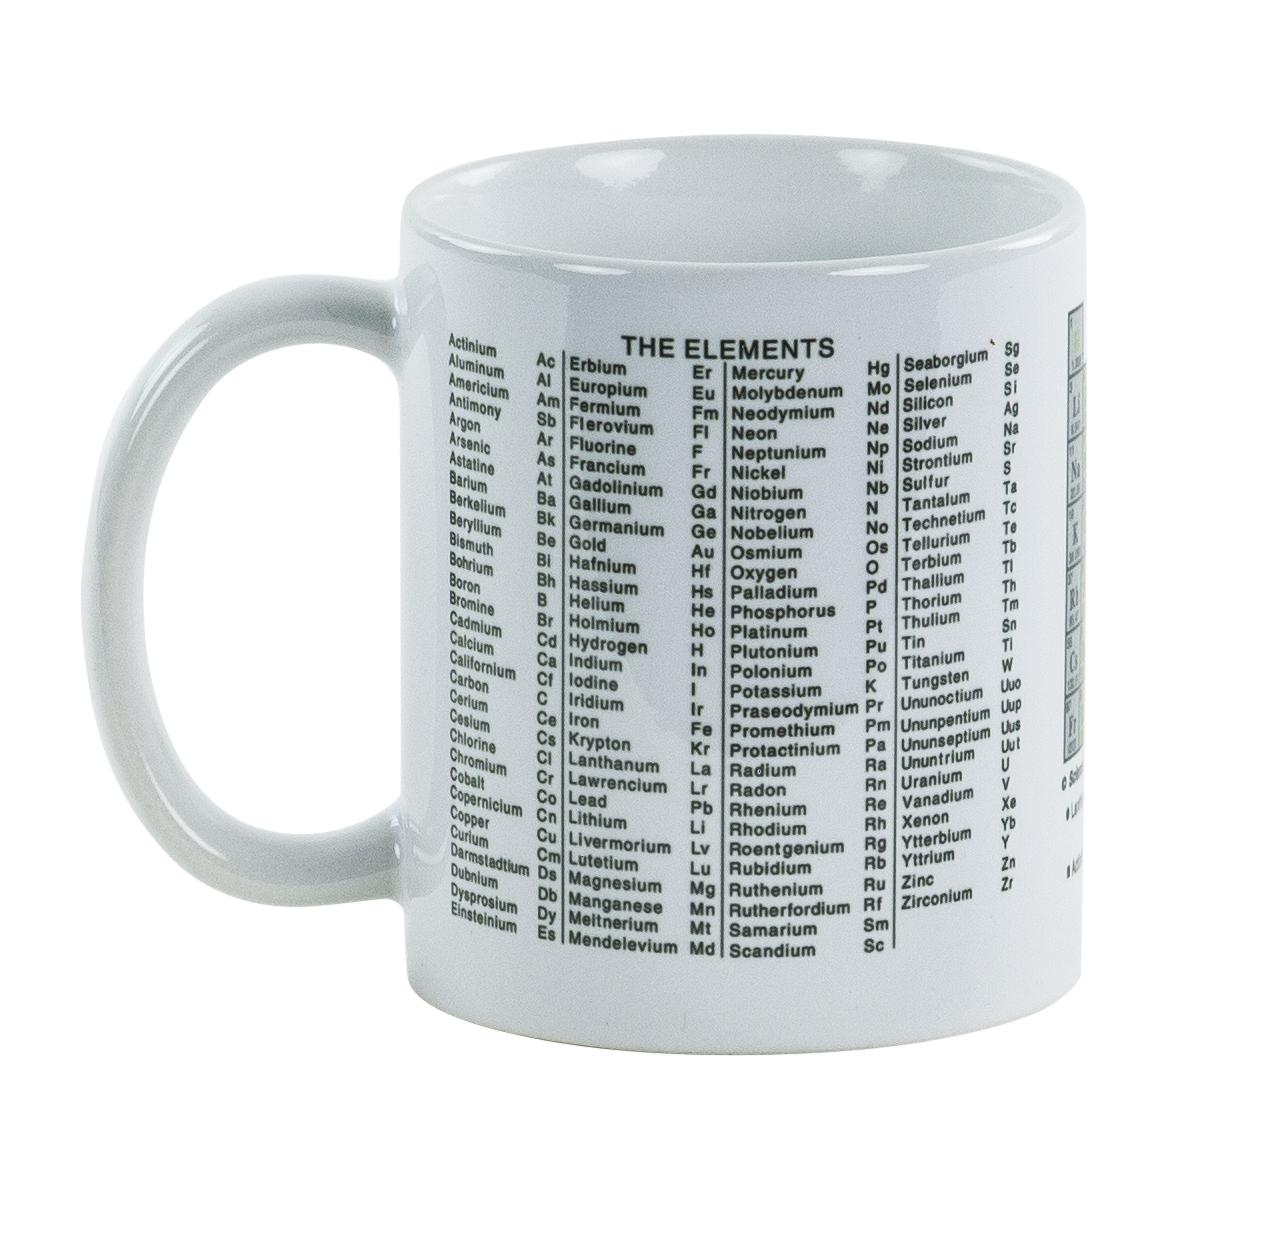 Periodic Table Of The Elements Mug Scientifics Com